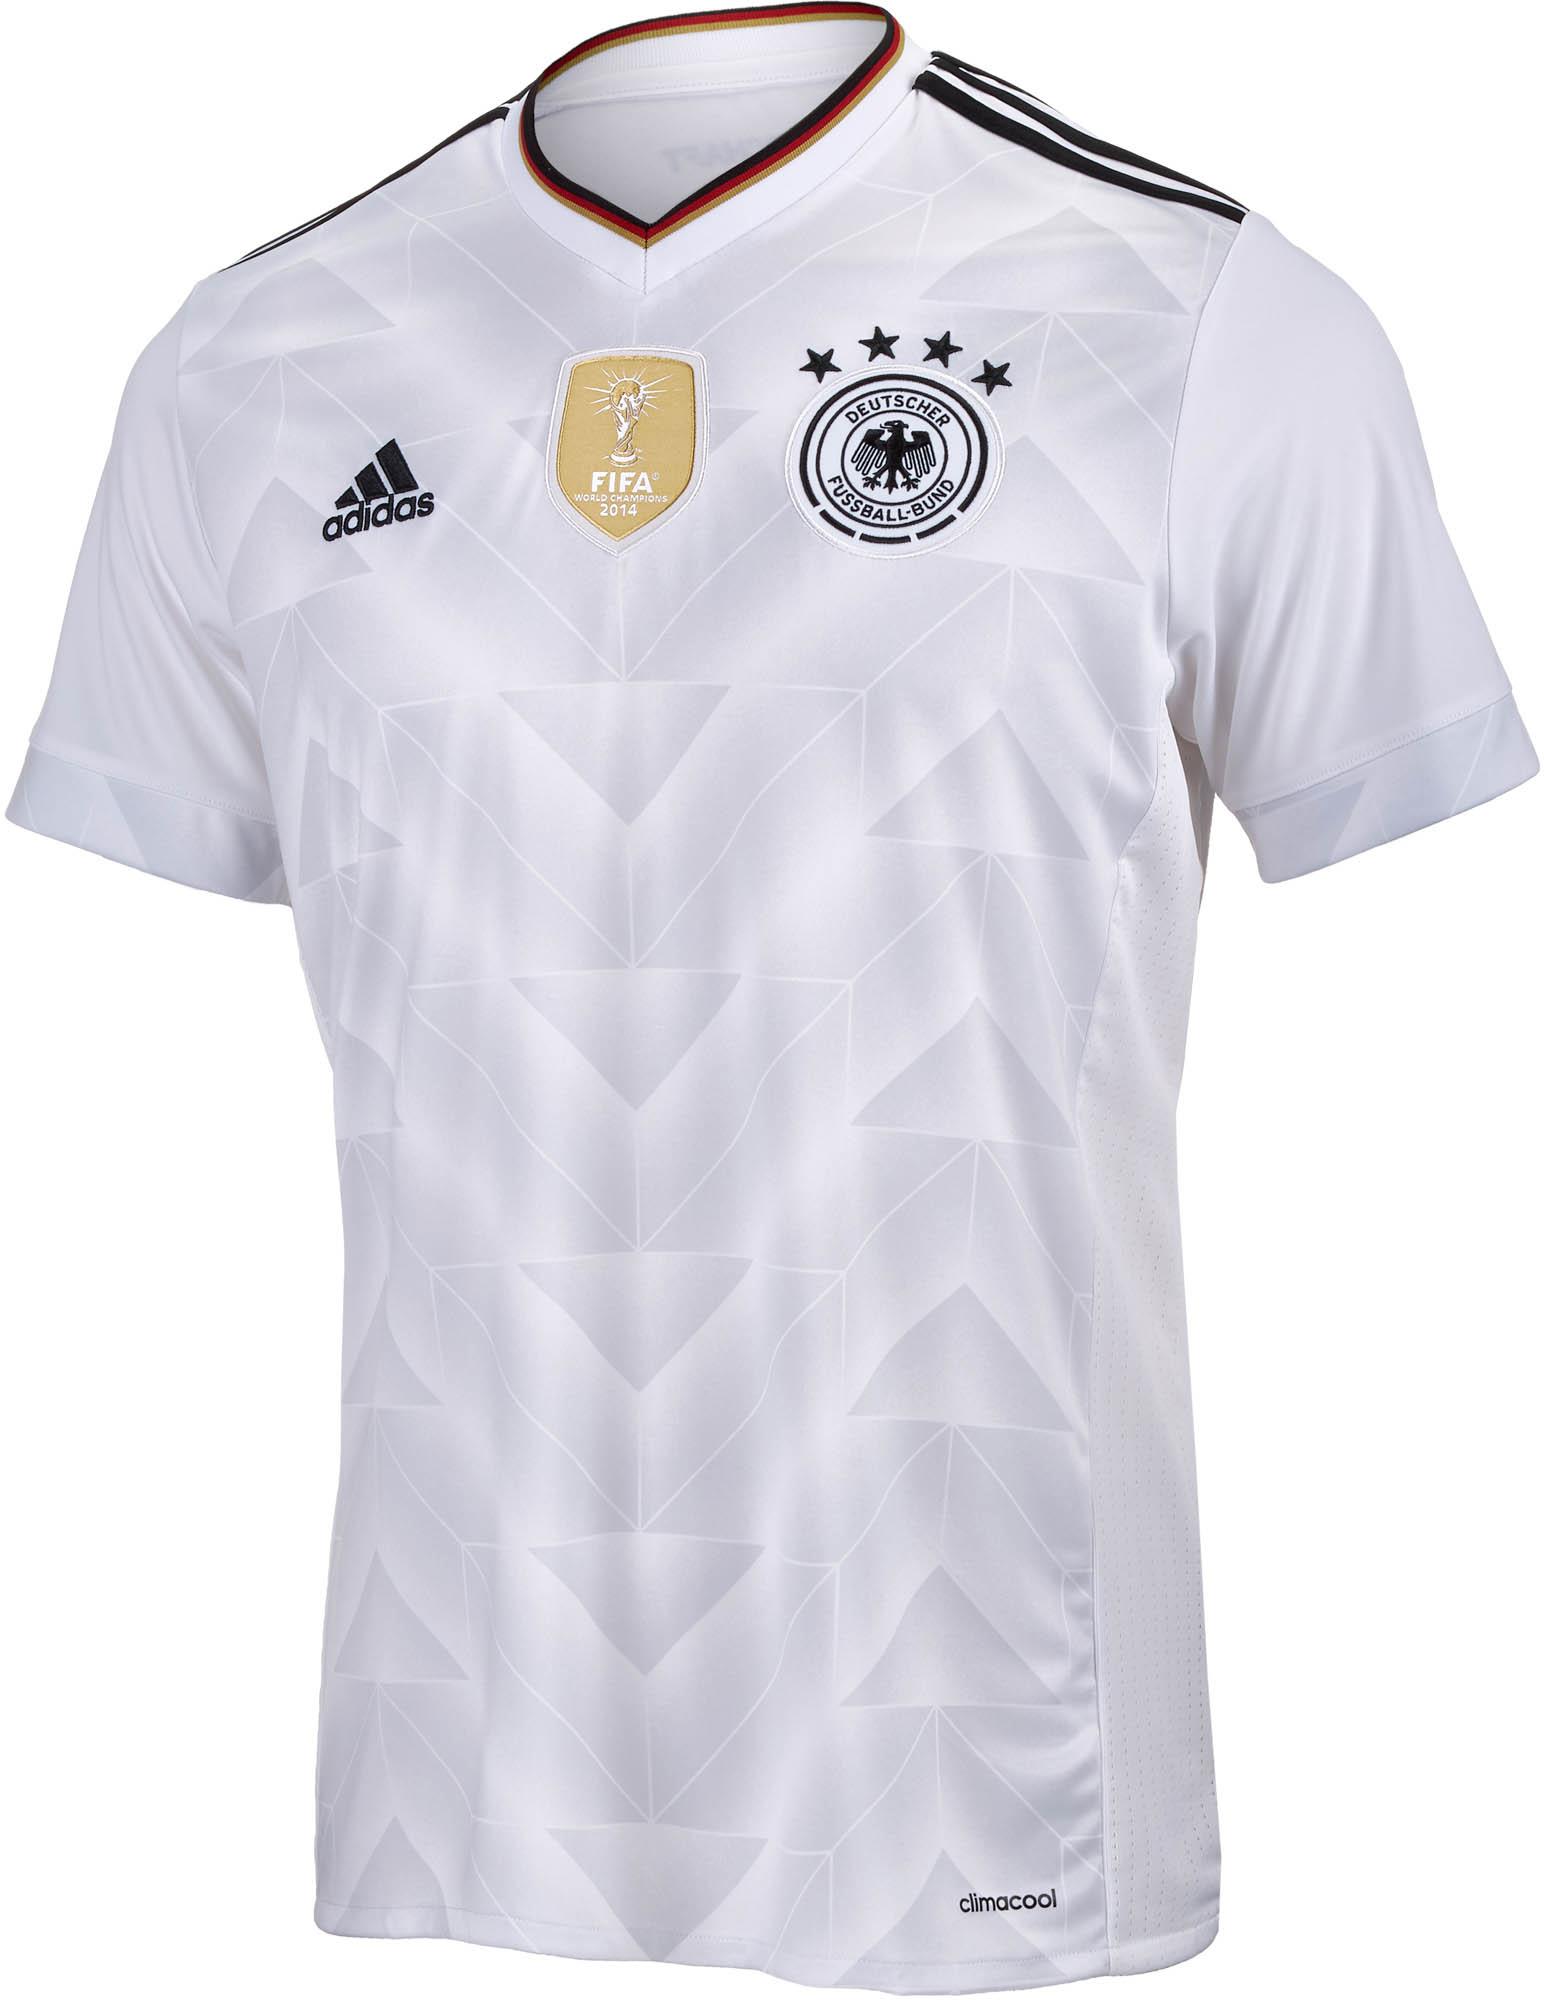 b3512fefaf40 adidas Kids 2017/18 Germany Home Soccer Jerseys